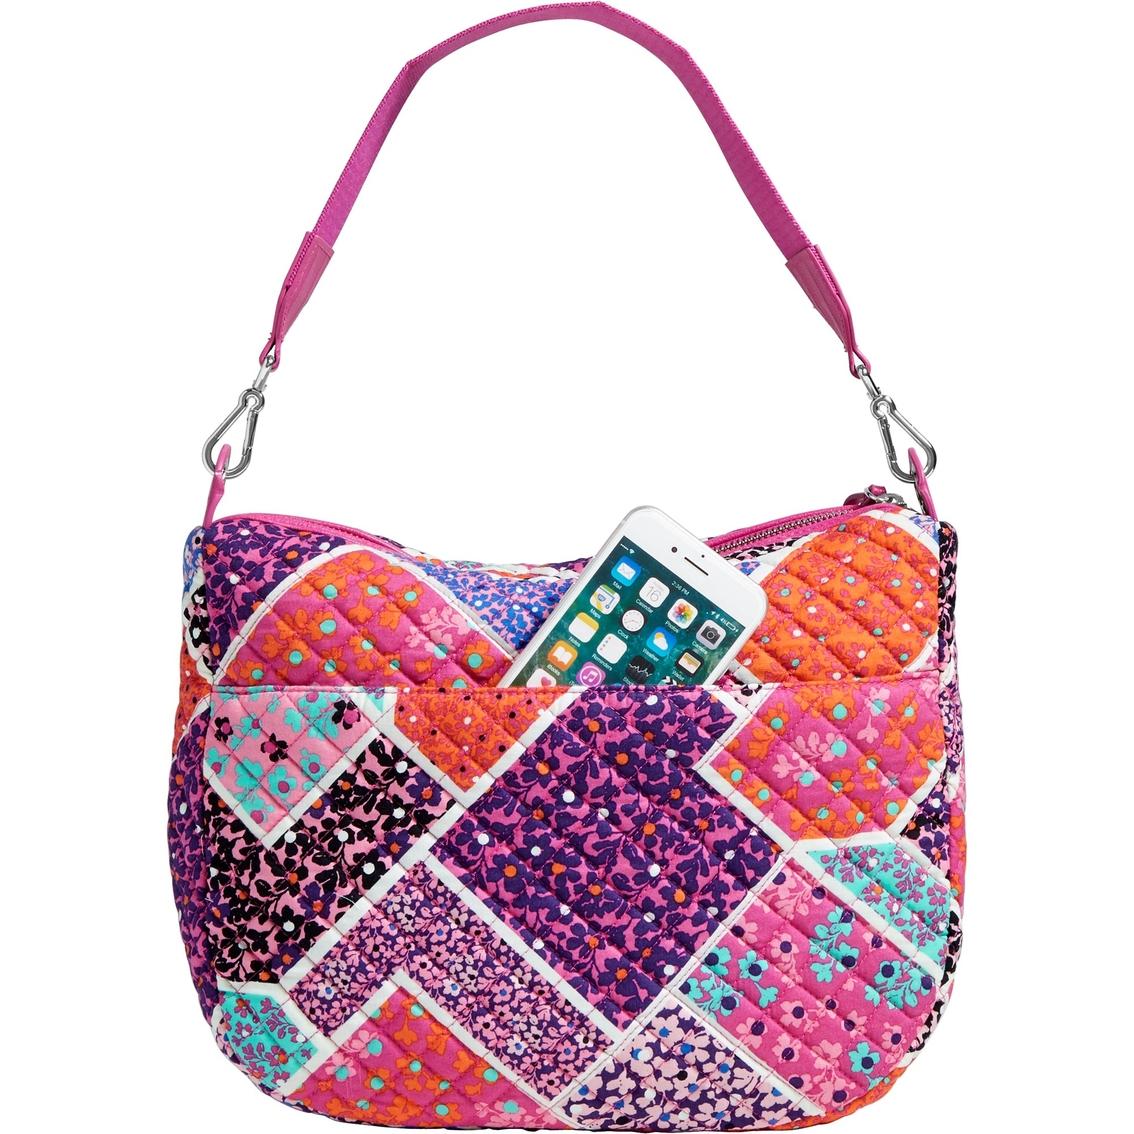 Vera Bradley Carson Shoulder Bag, Modern Medley | Shop By Pattern ...